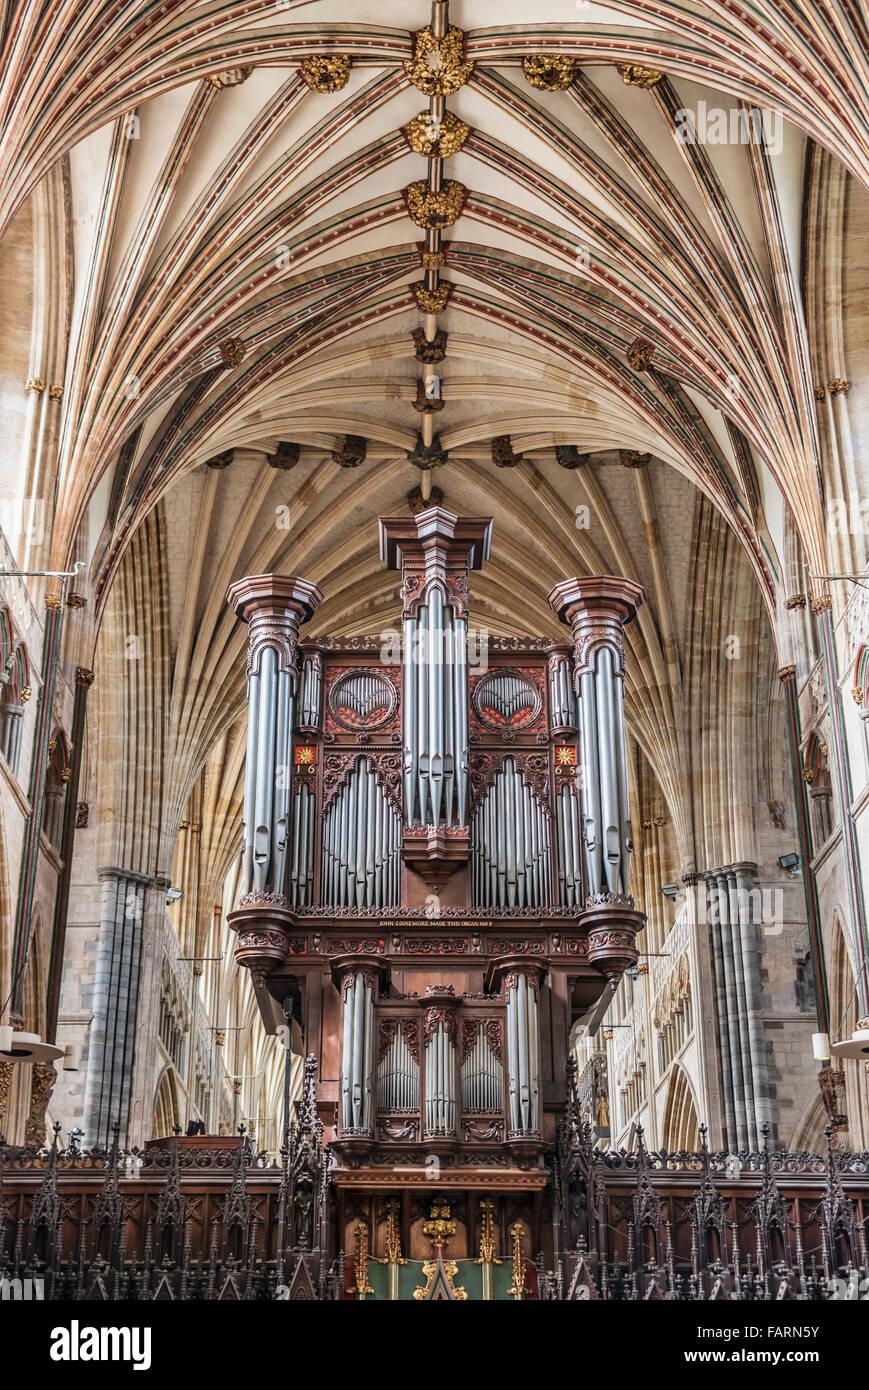 Interior of Exeter Cathedral, Devon, England, UK | Innenaufnahme des Kathedrale von Exeter, England, UK Stock Photo